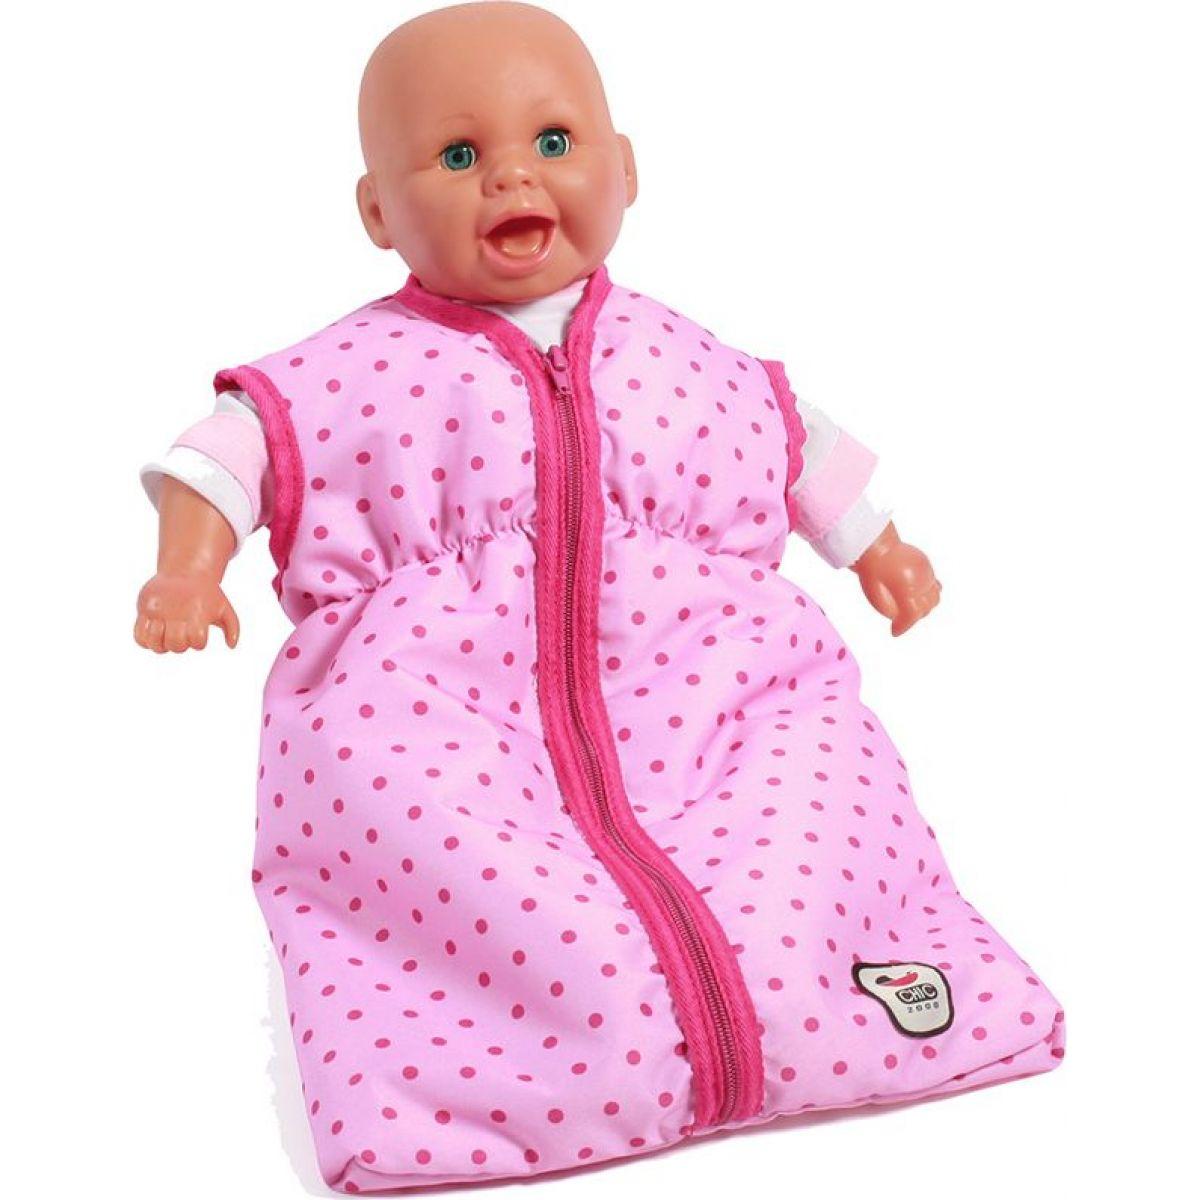 Bayer Chic Spací vak pre bábiky - Pink Dots